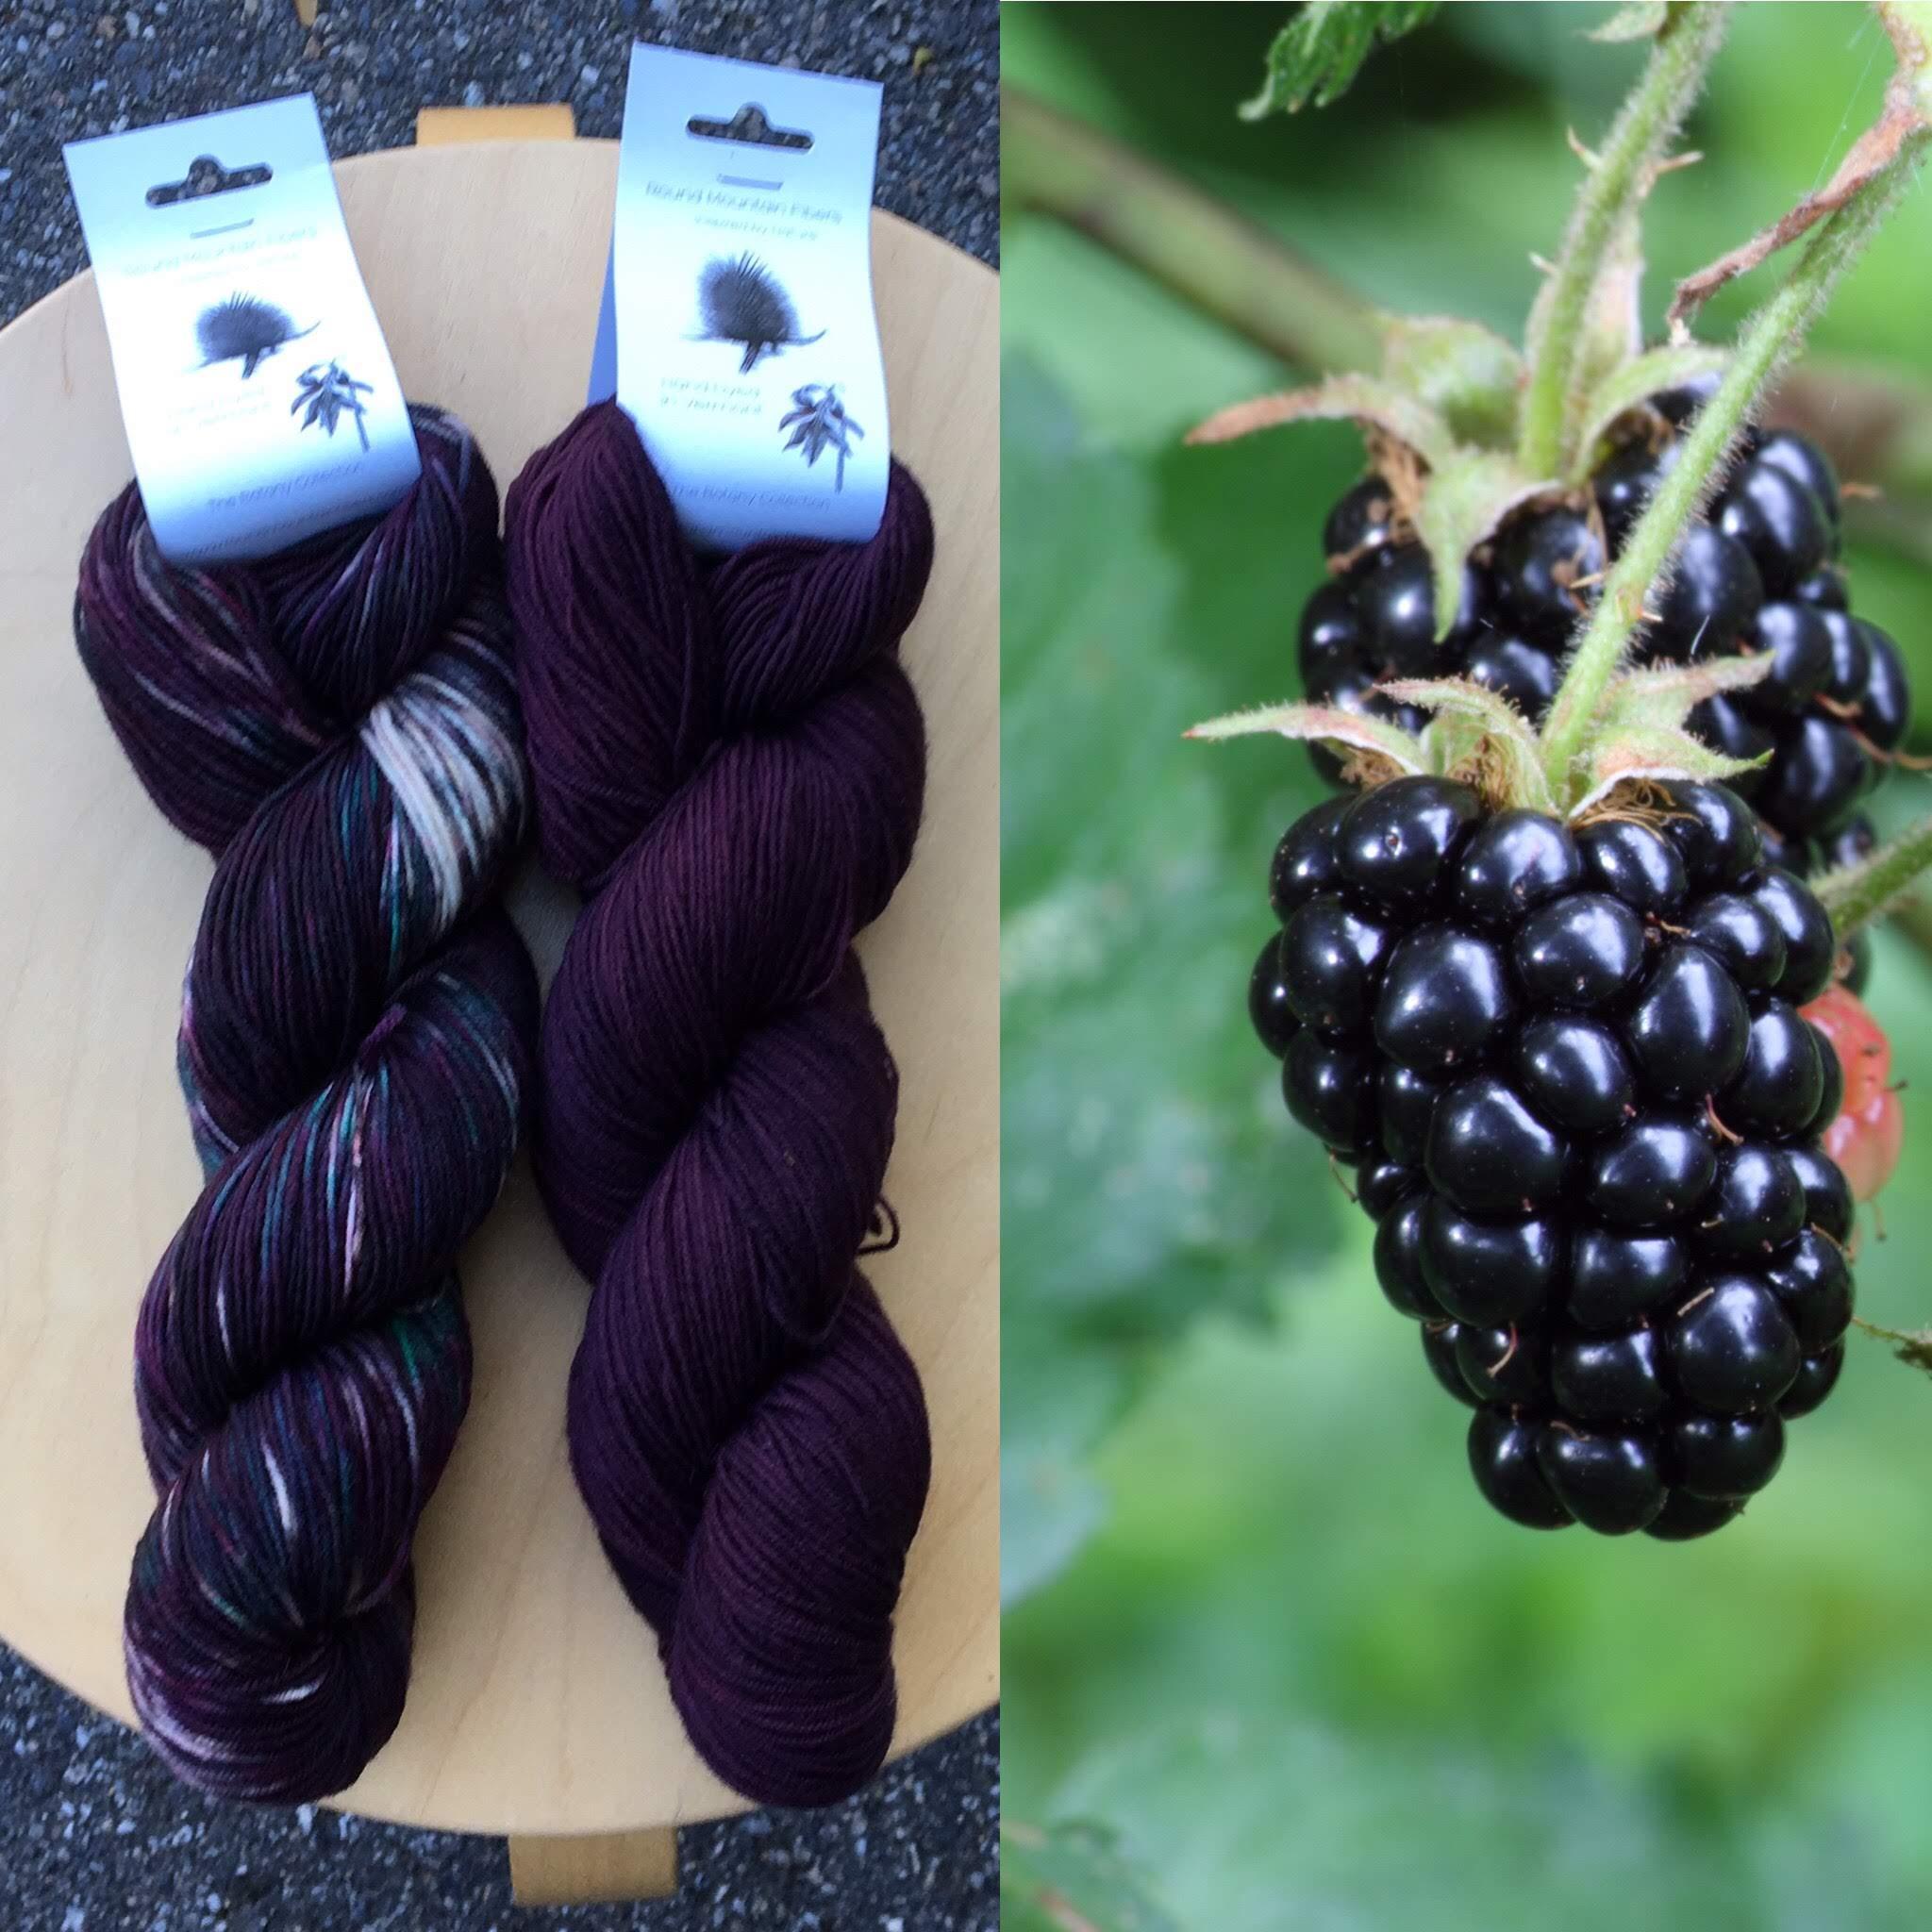 October Botany Club: Blackberries and Blackberry Juice.